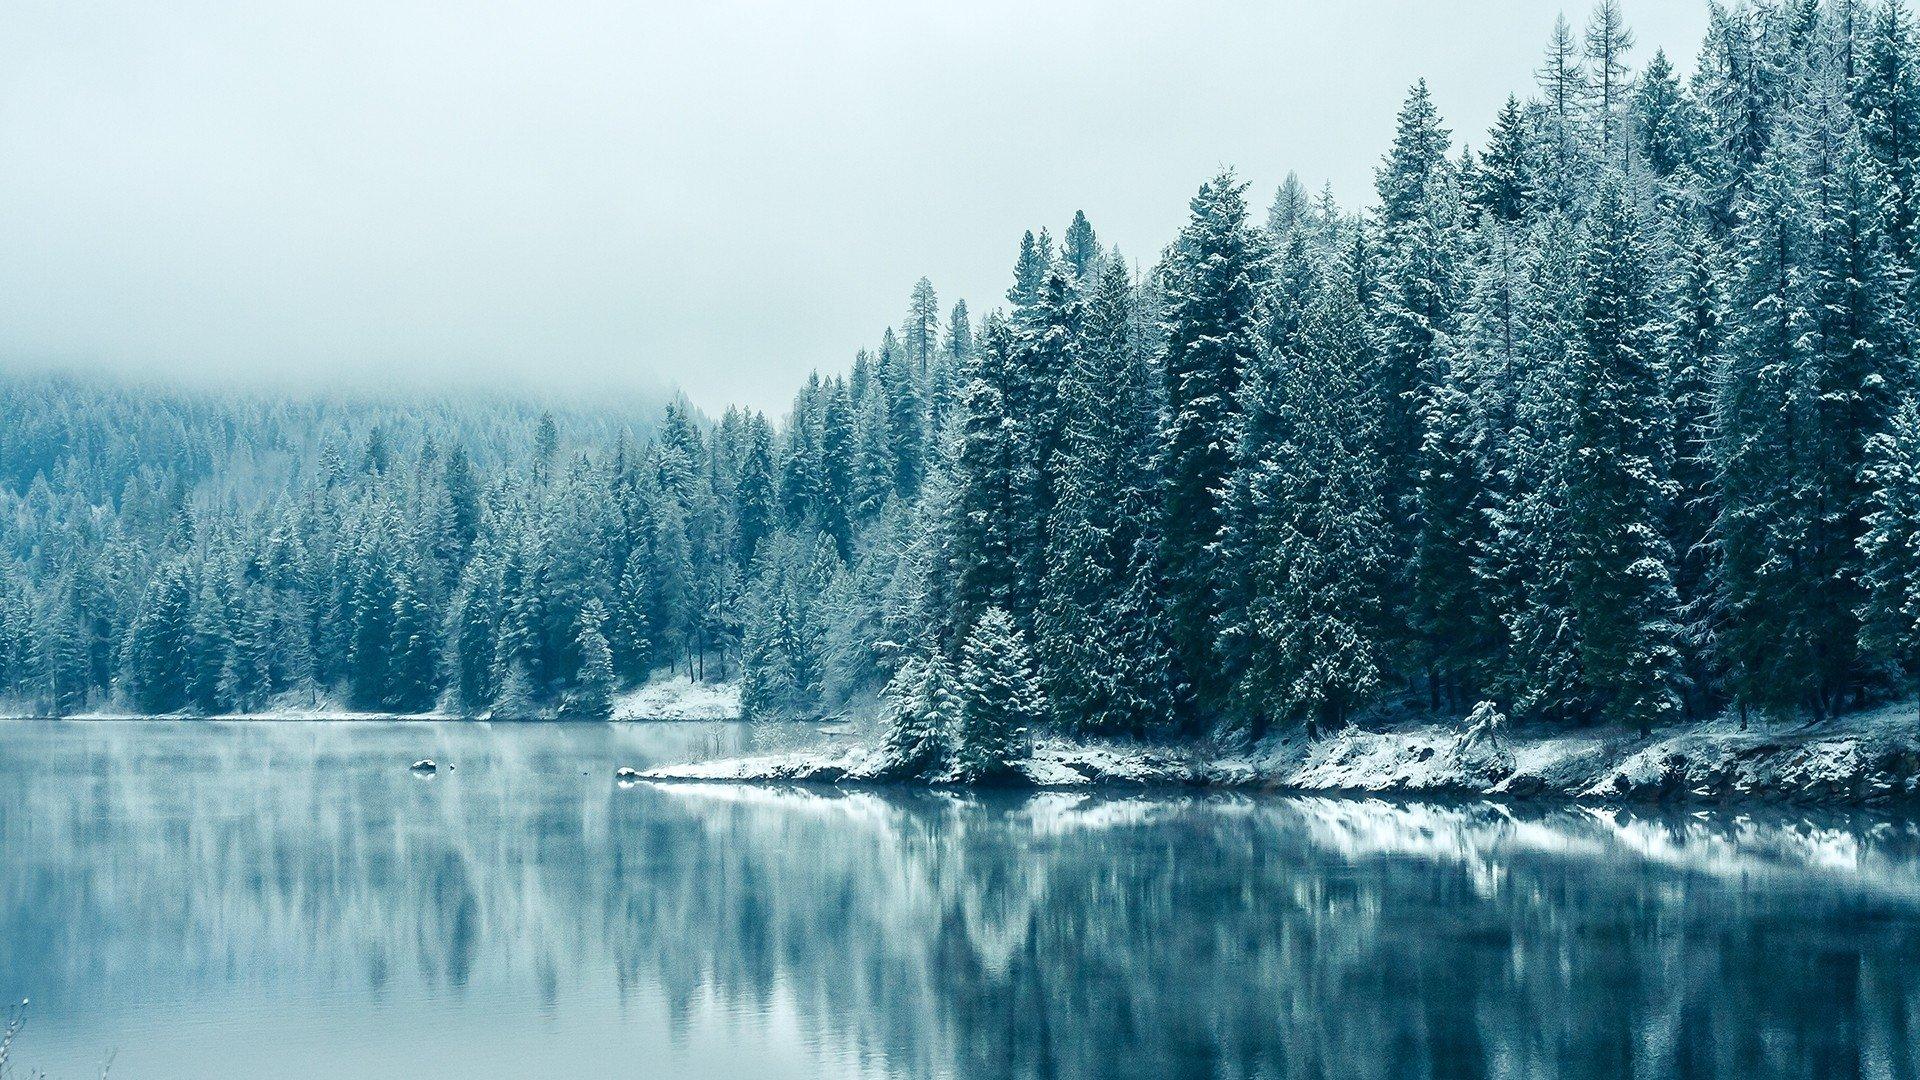 Winter Aesthetic Wallpaper Image